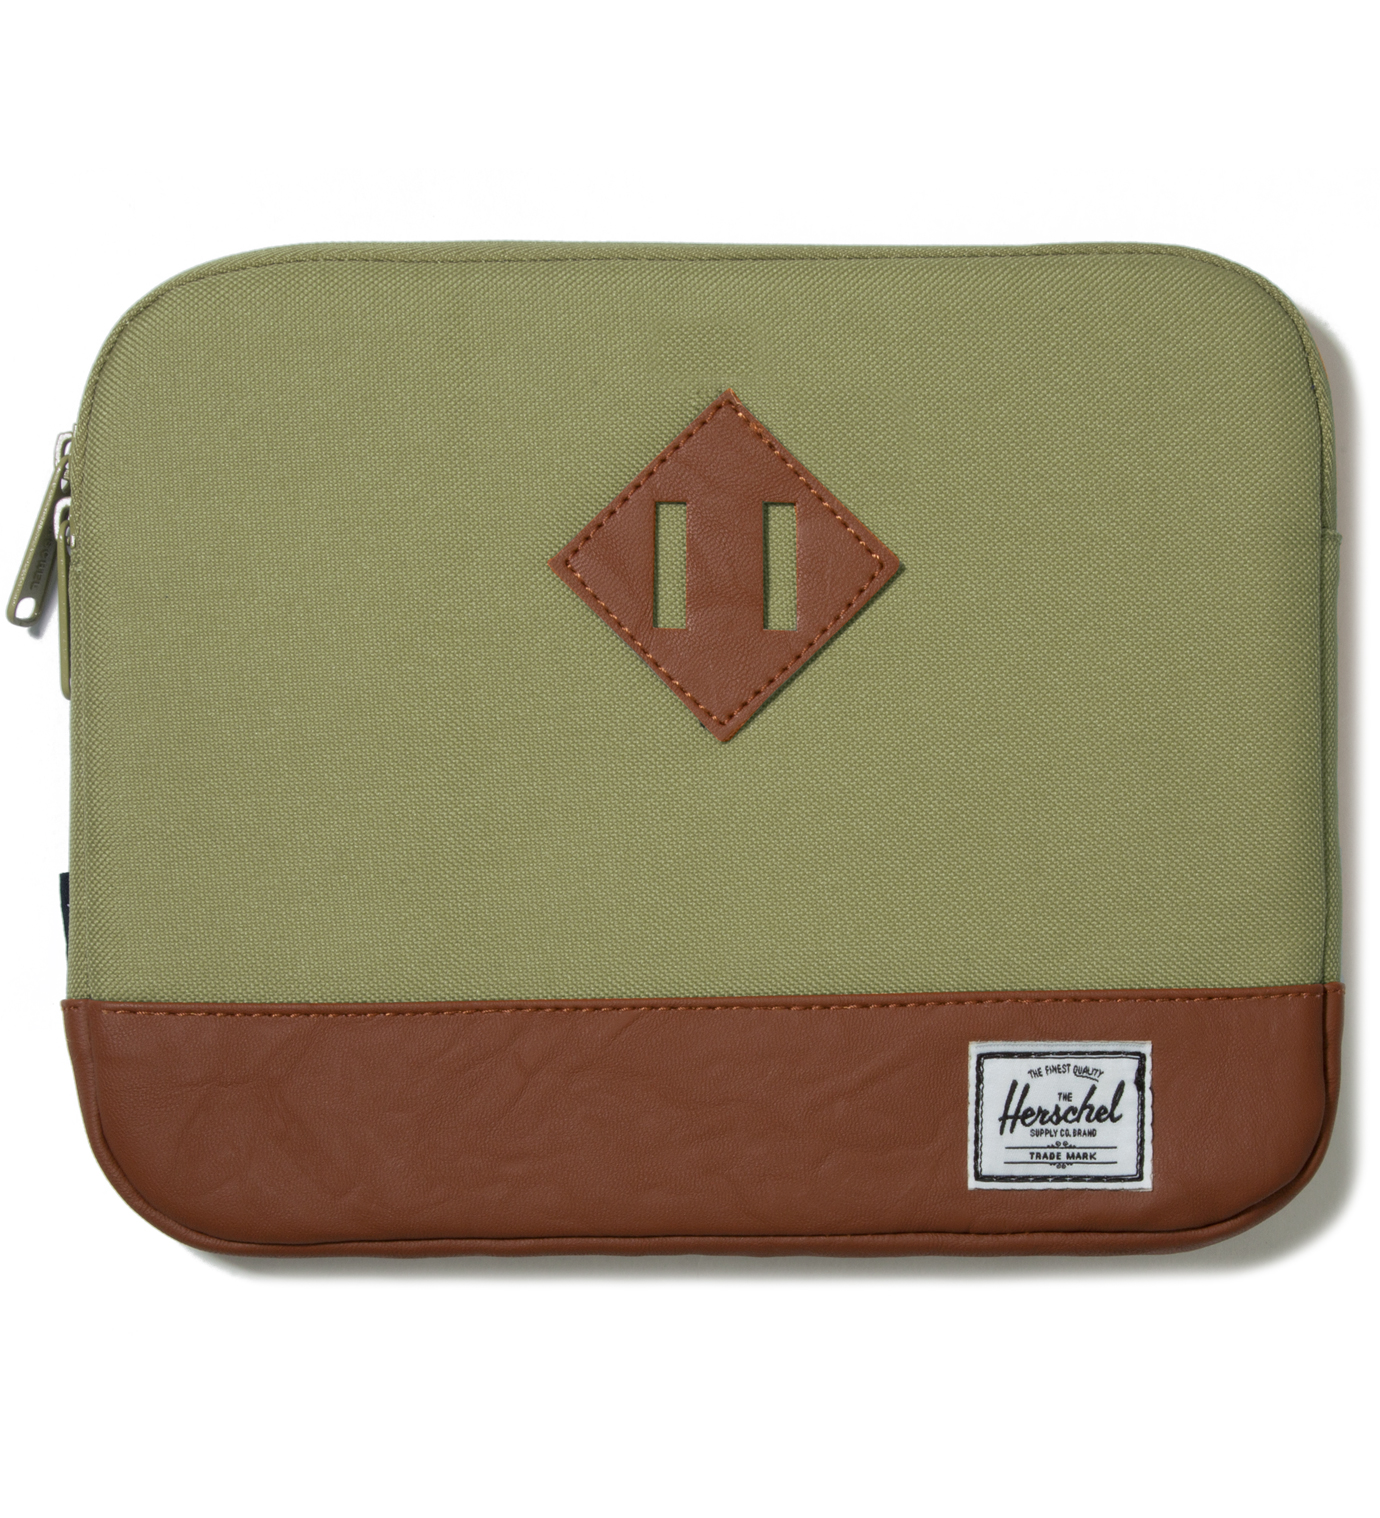 Herschel Supply Co. Olive Drab Heritage iPad Sleeve